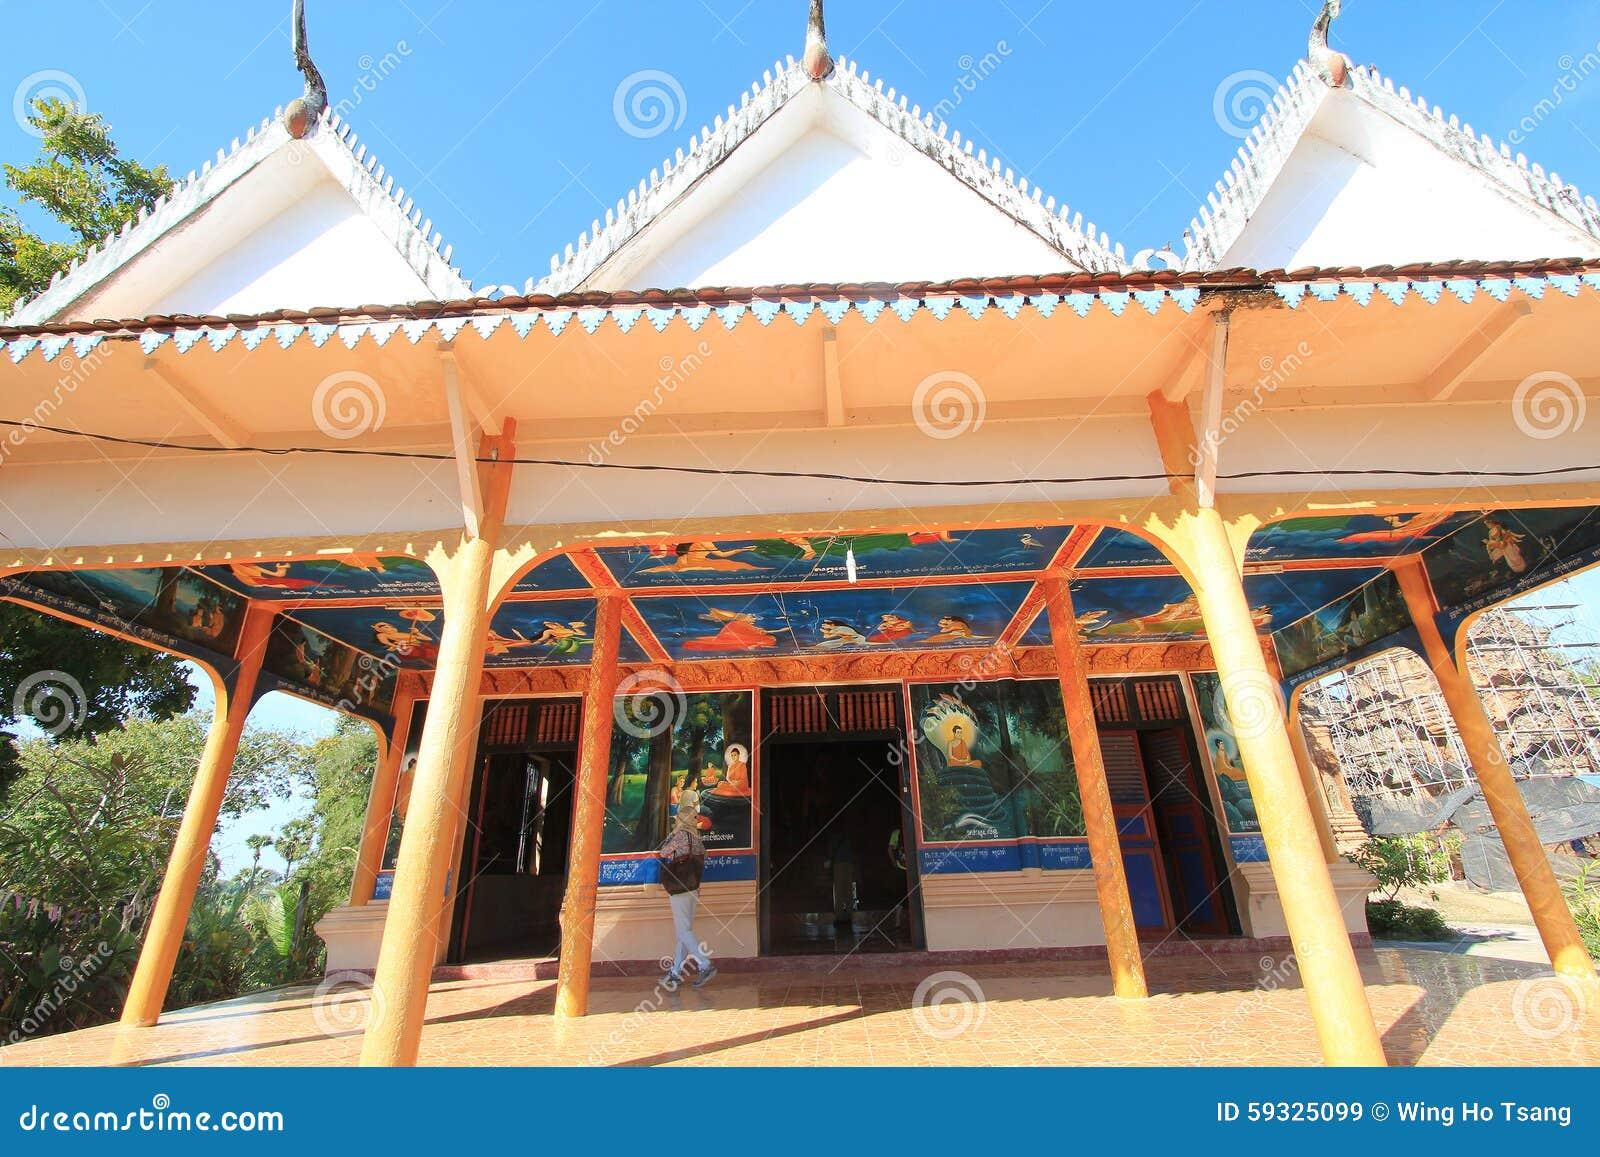 Cambodia, Siem Reap, January 22nd, 2014, Angkor Thom ...